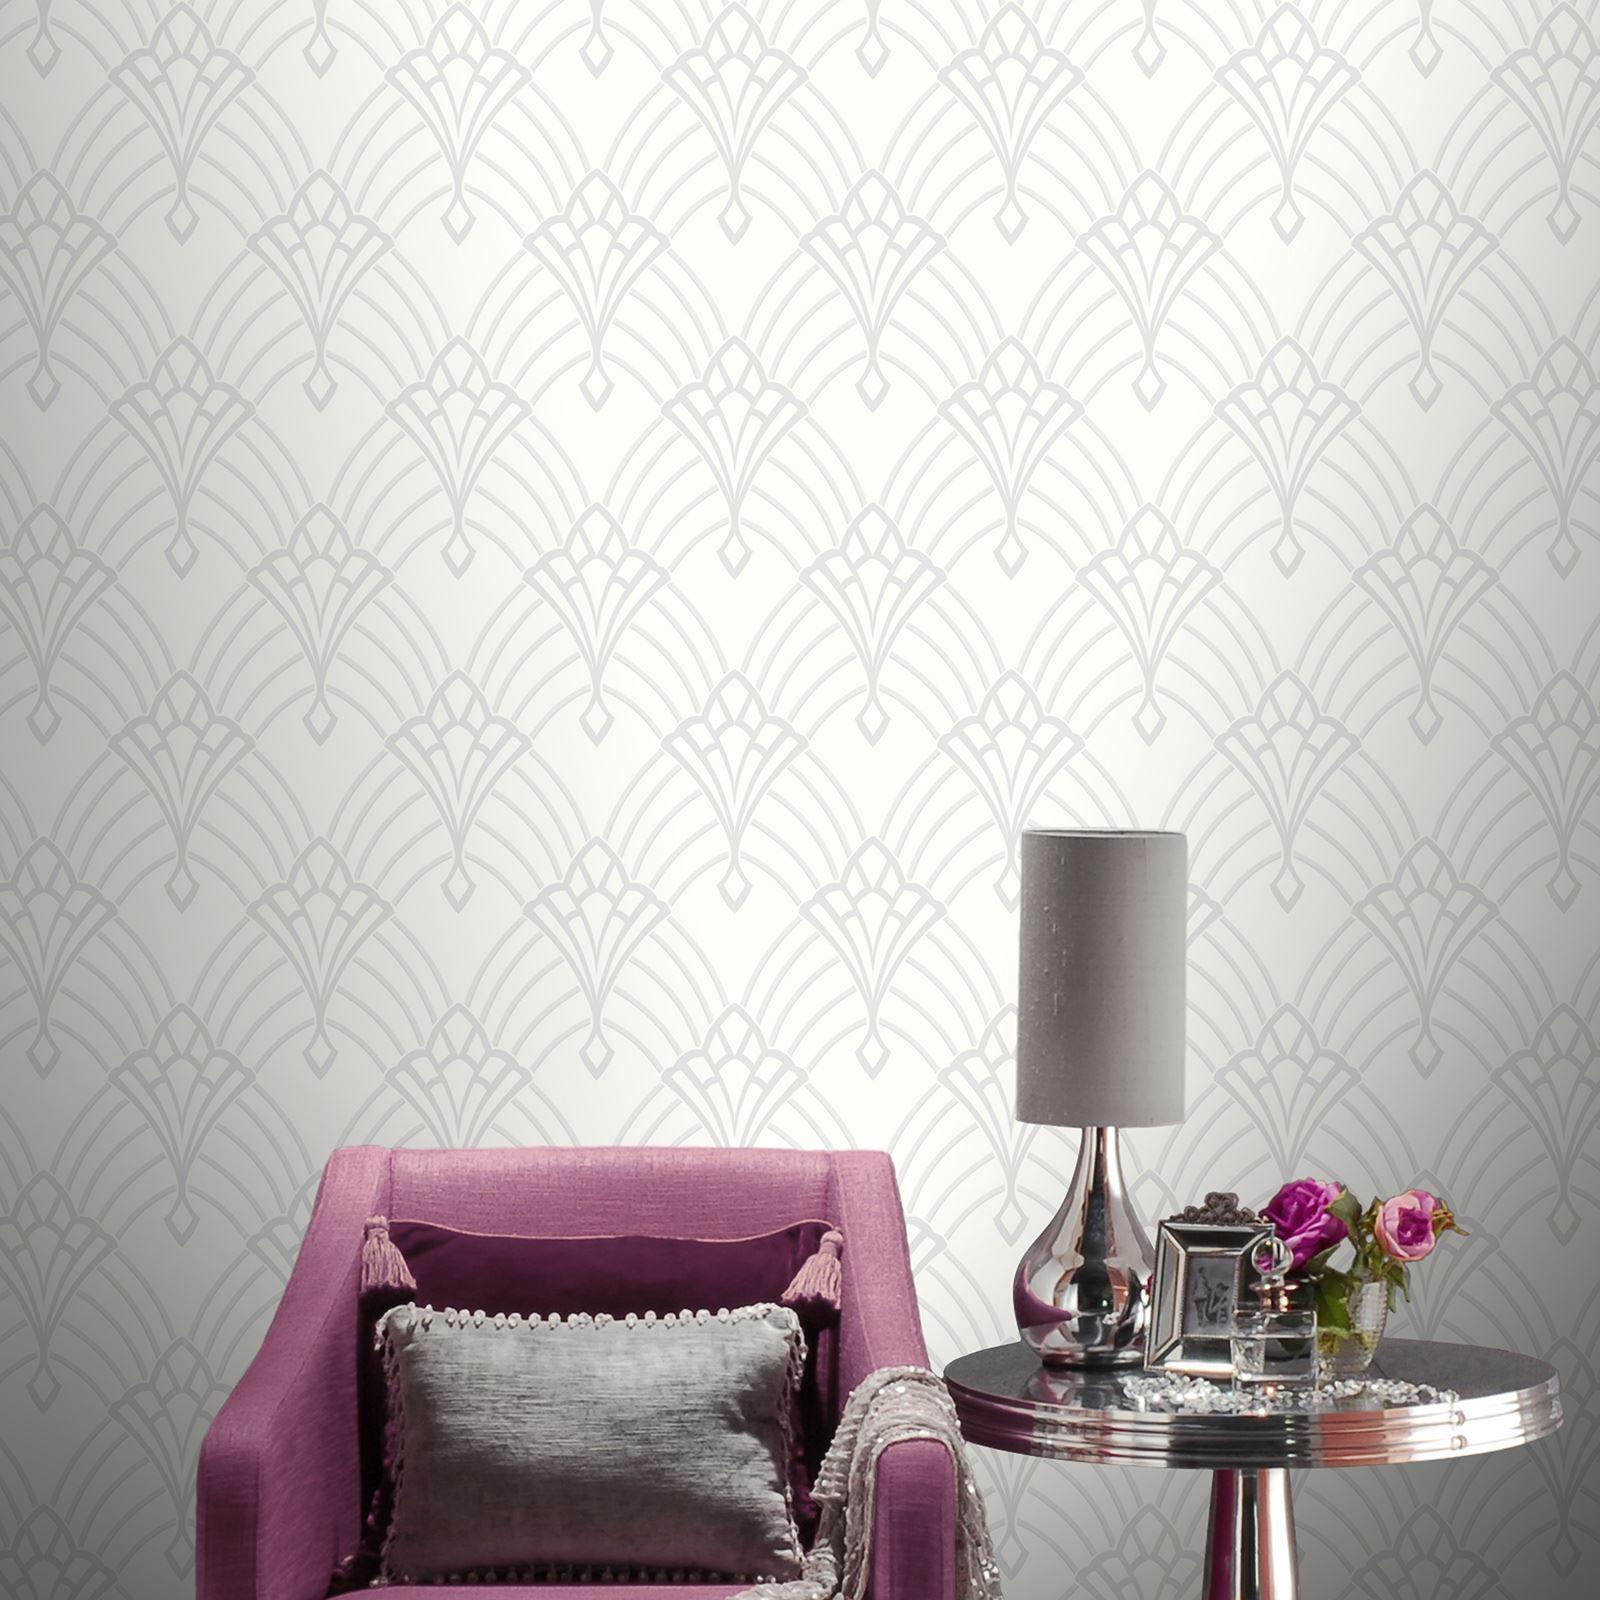 astoria art deco tapete wei silber rasch 305302 glitzer neu ebay. Black Bedroom Furniture Sets. Home Design Ideas